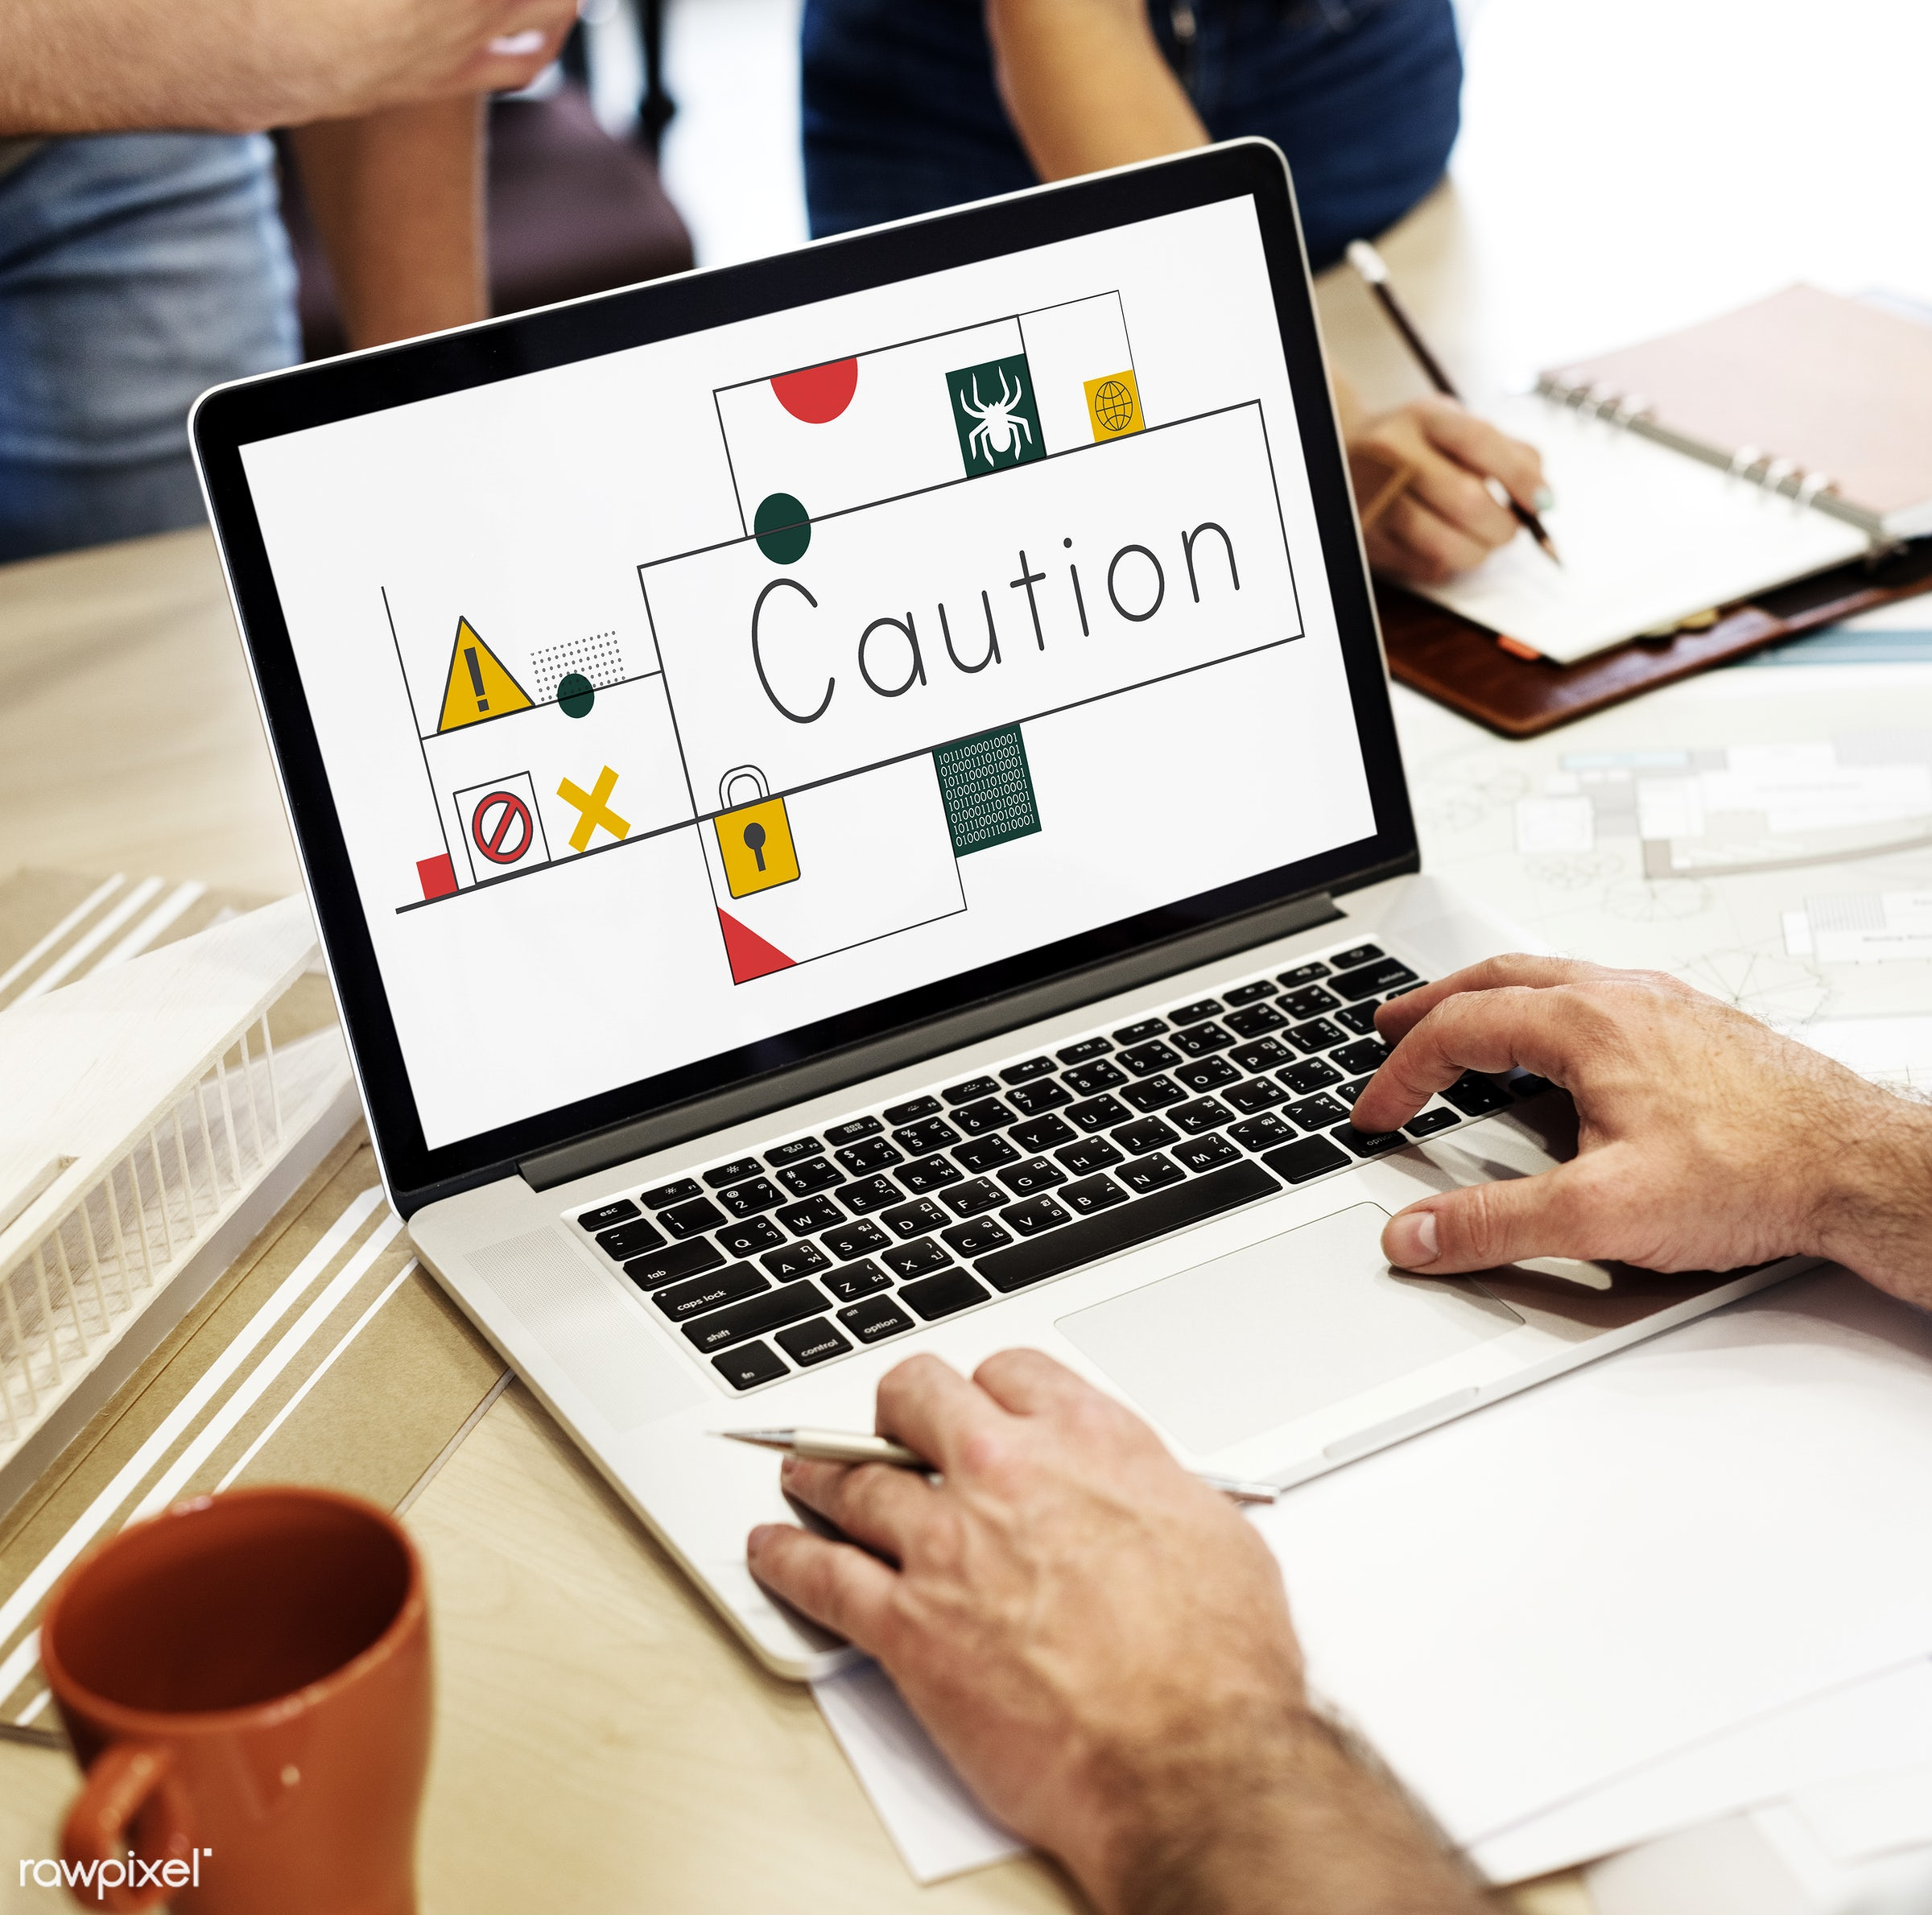 alert, architect, architecture, art, blueprint, caution, cloud, coffee, coffee cup, connection, control, cup, cyber error,...